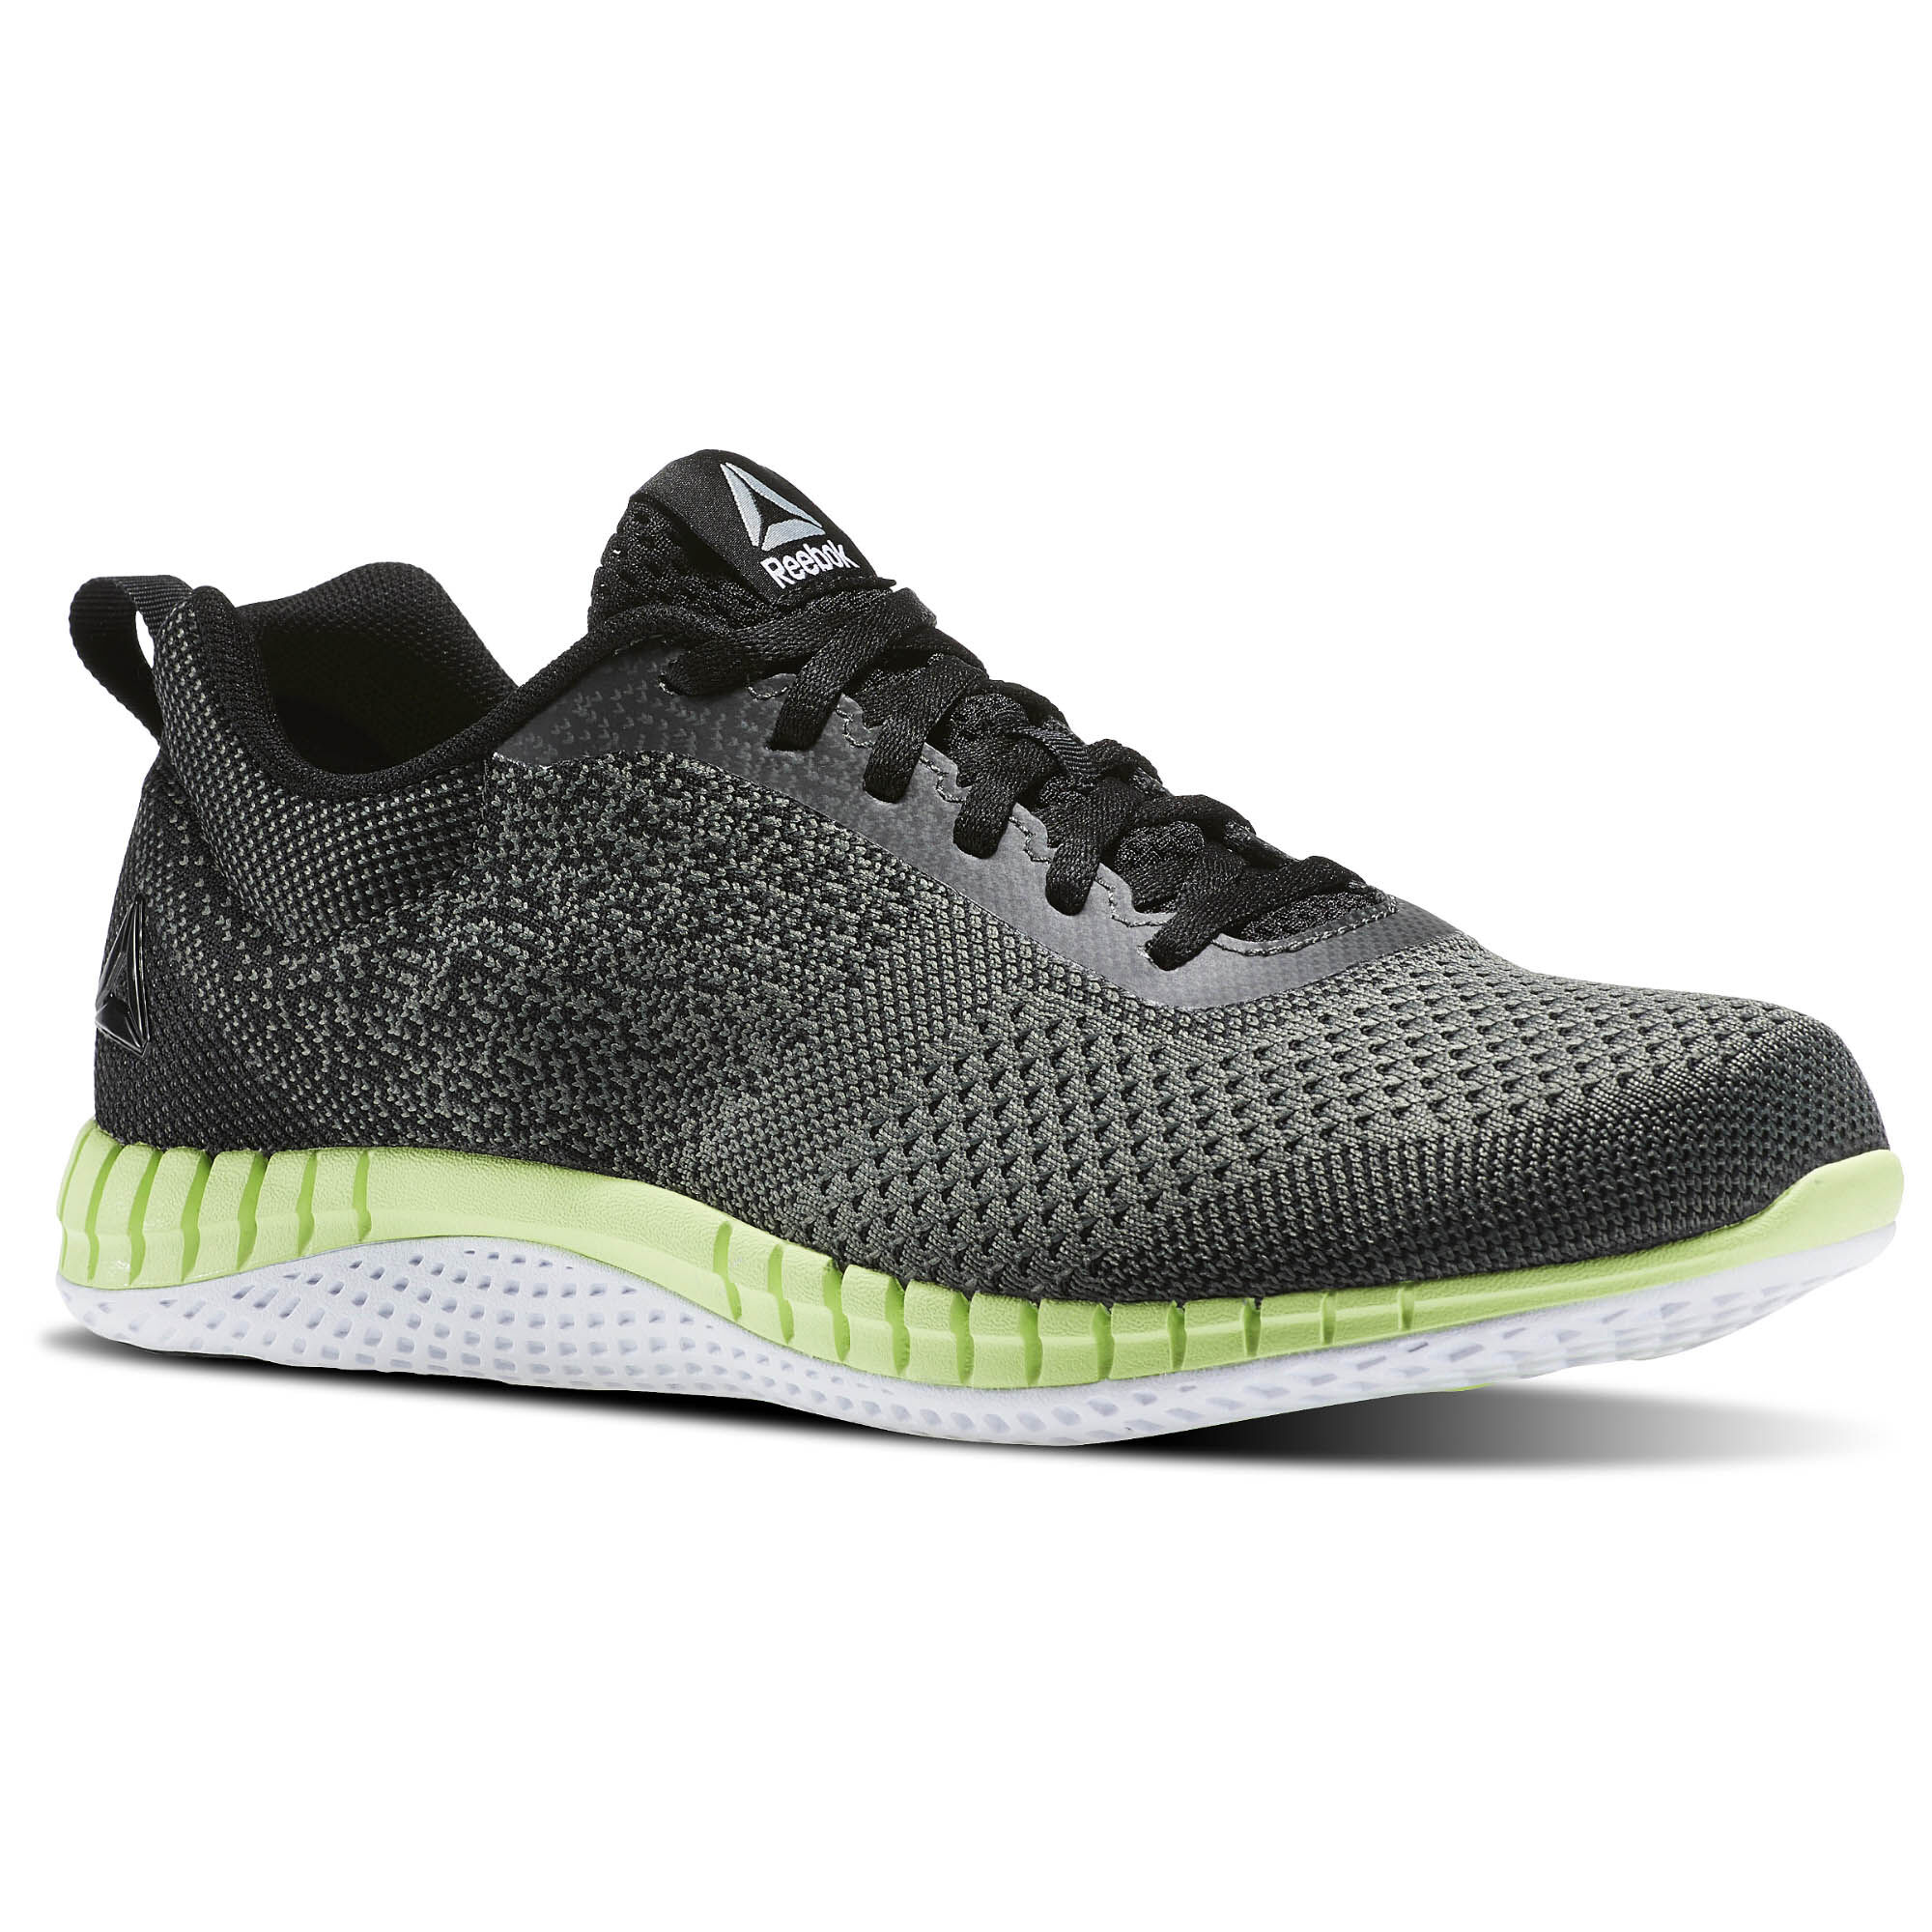 Reebok Z Rated Print Run Shoes Black